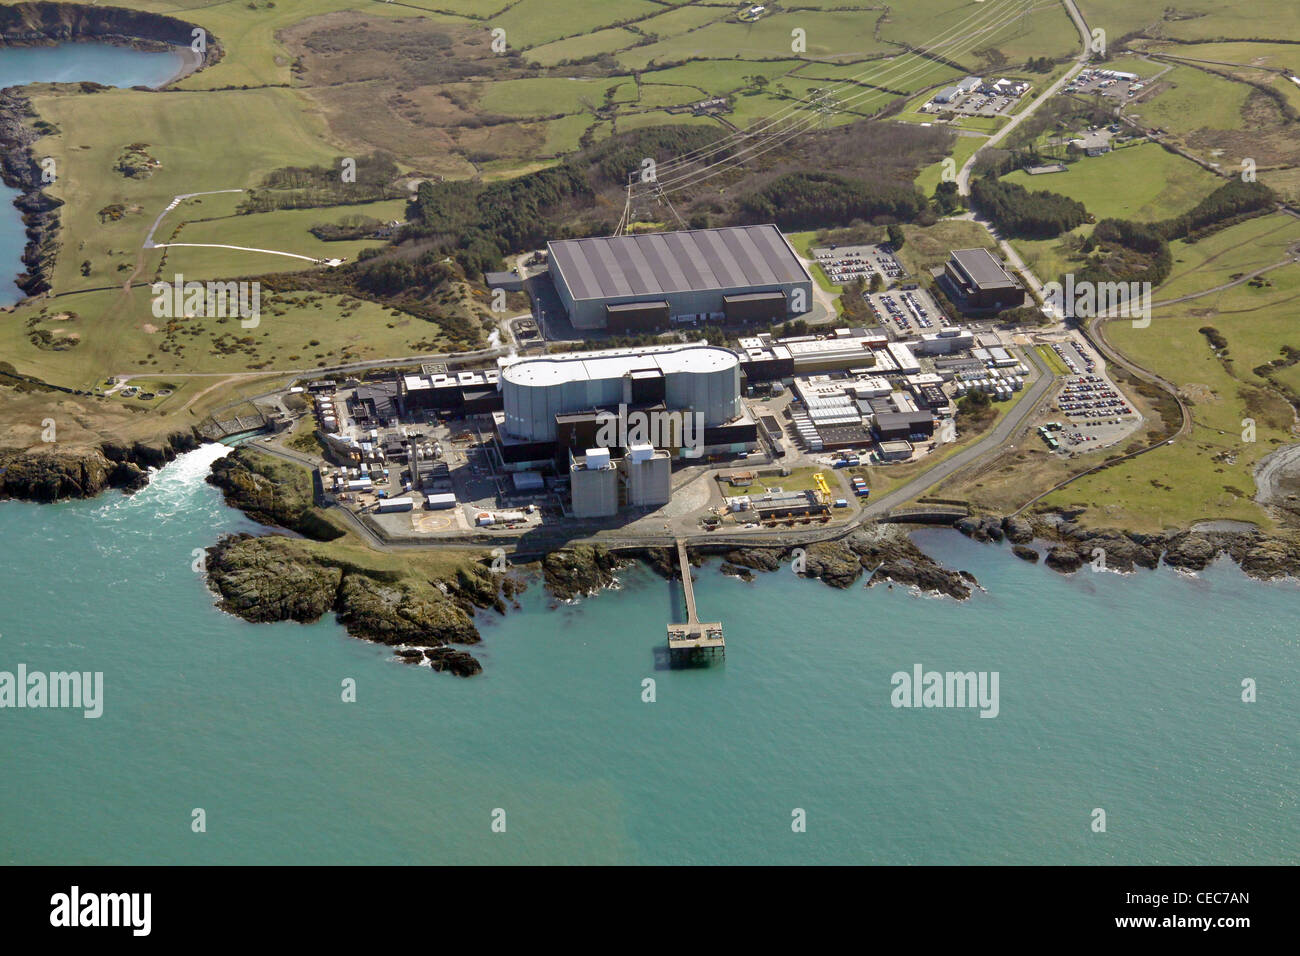 Luftaufnahme von Wylfa nuclear Power Station, Wylfa Head, Anglesey, North Wales, bezeichnet manchmal als Wilfa Stockbild